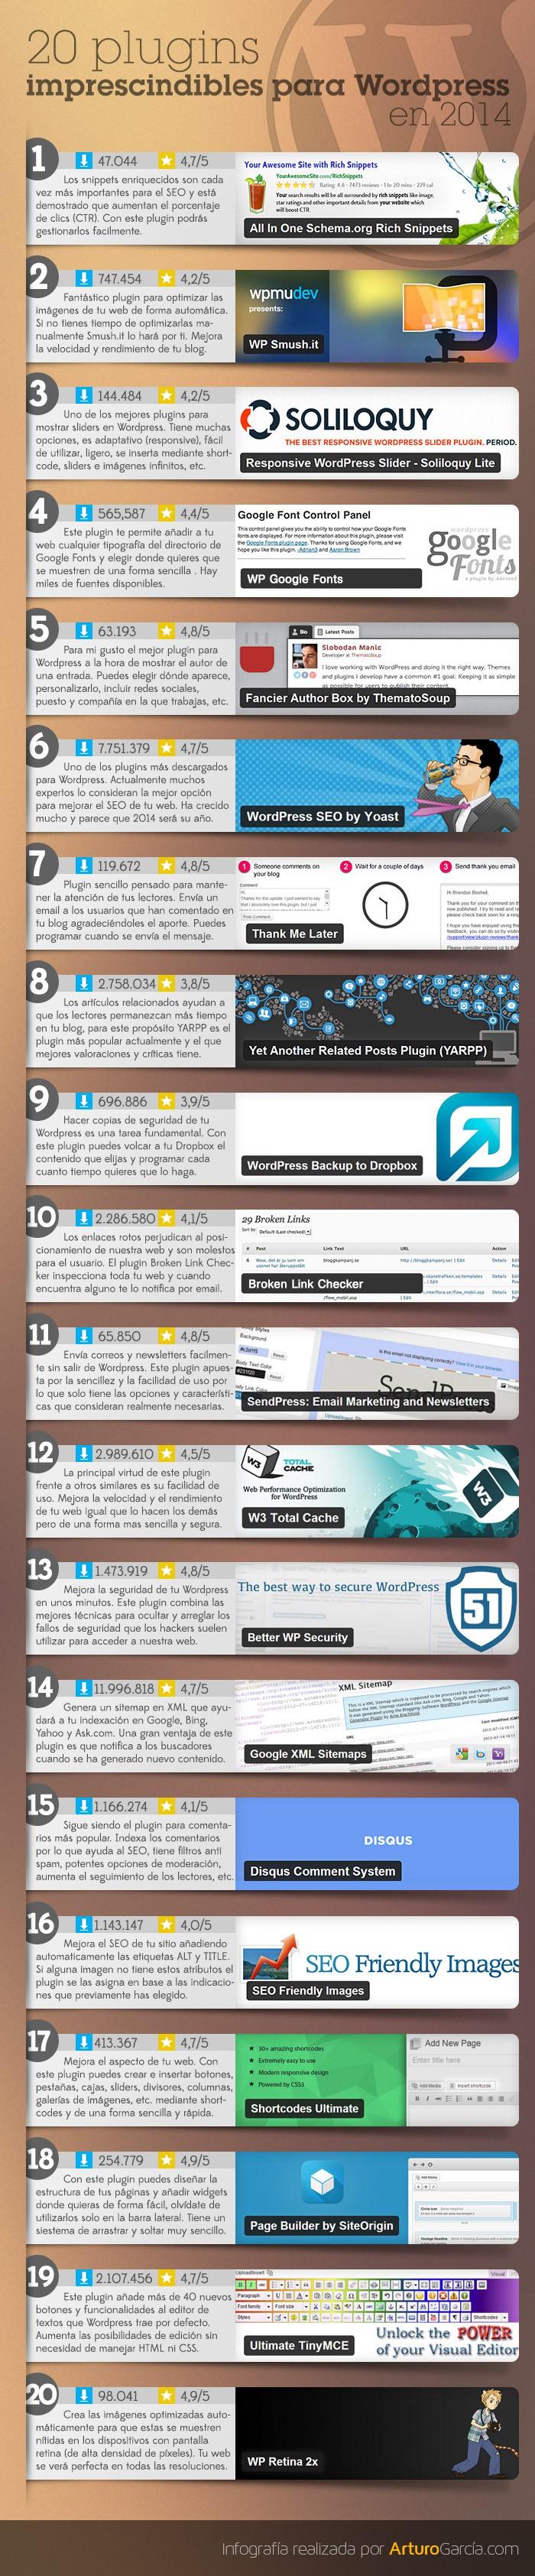 20-plugins-imprescindibles-wordpress-2014